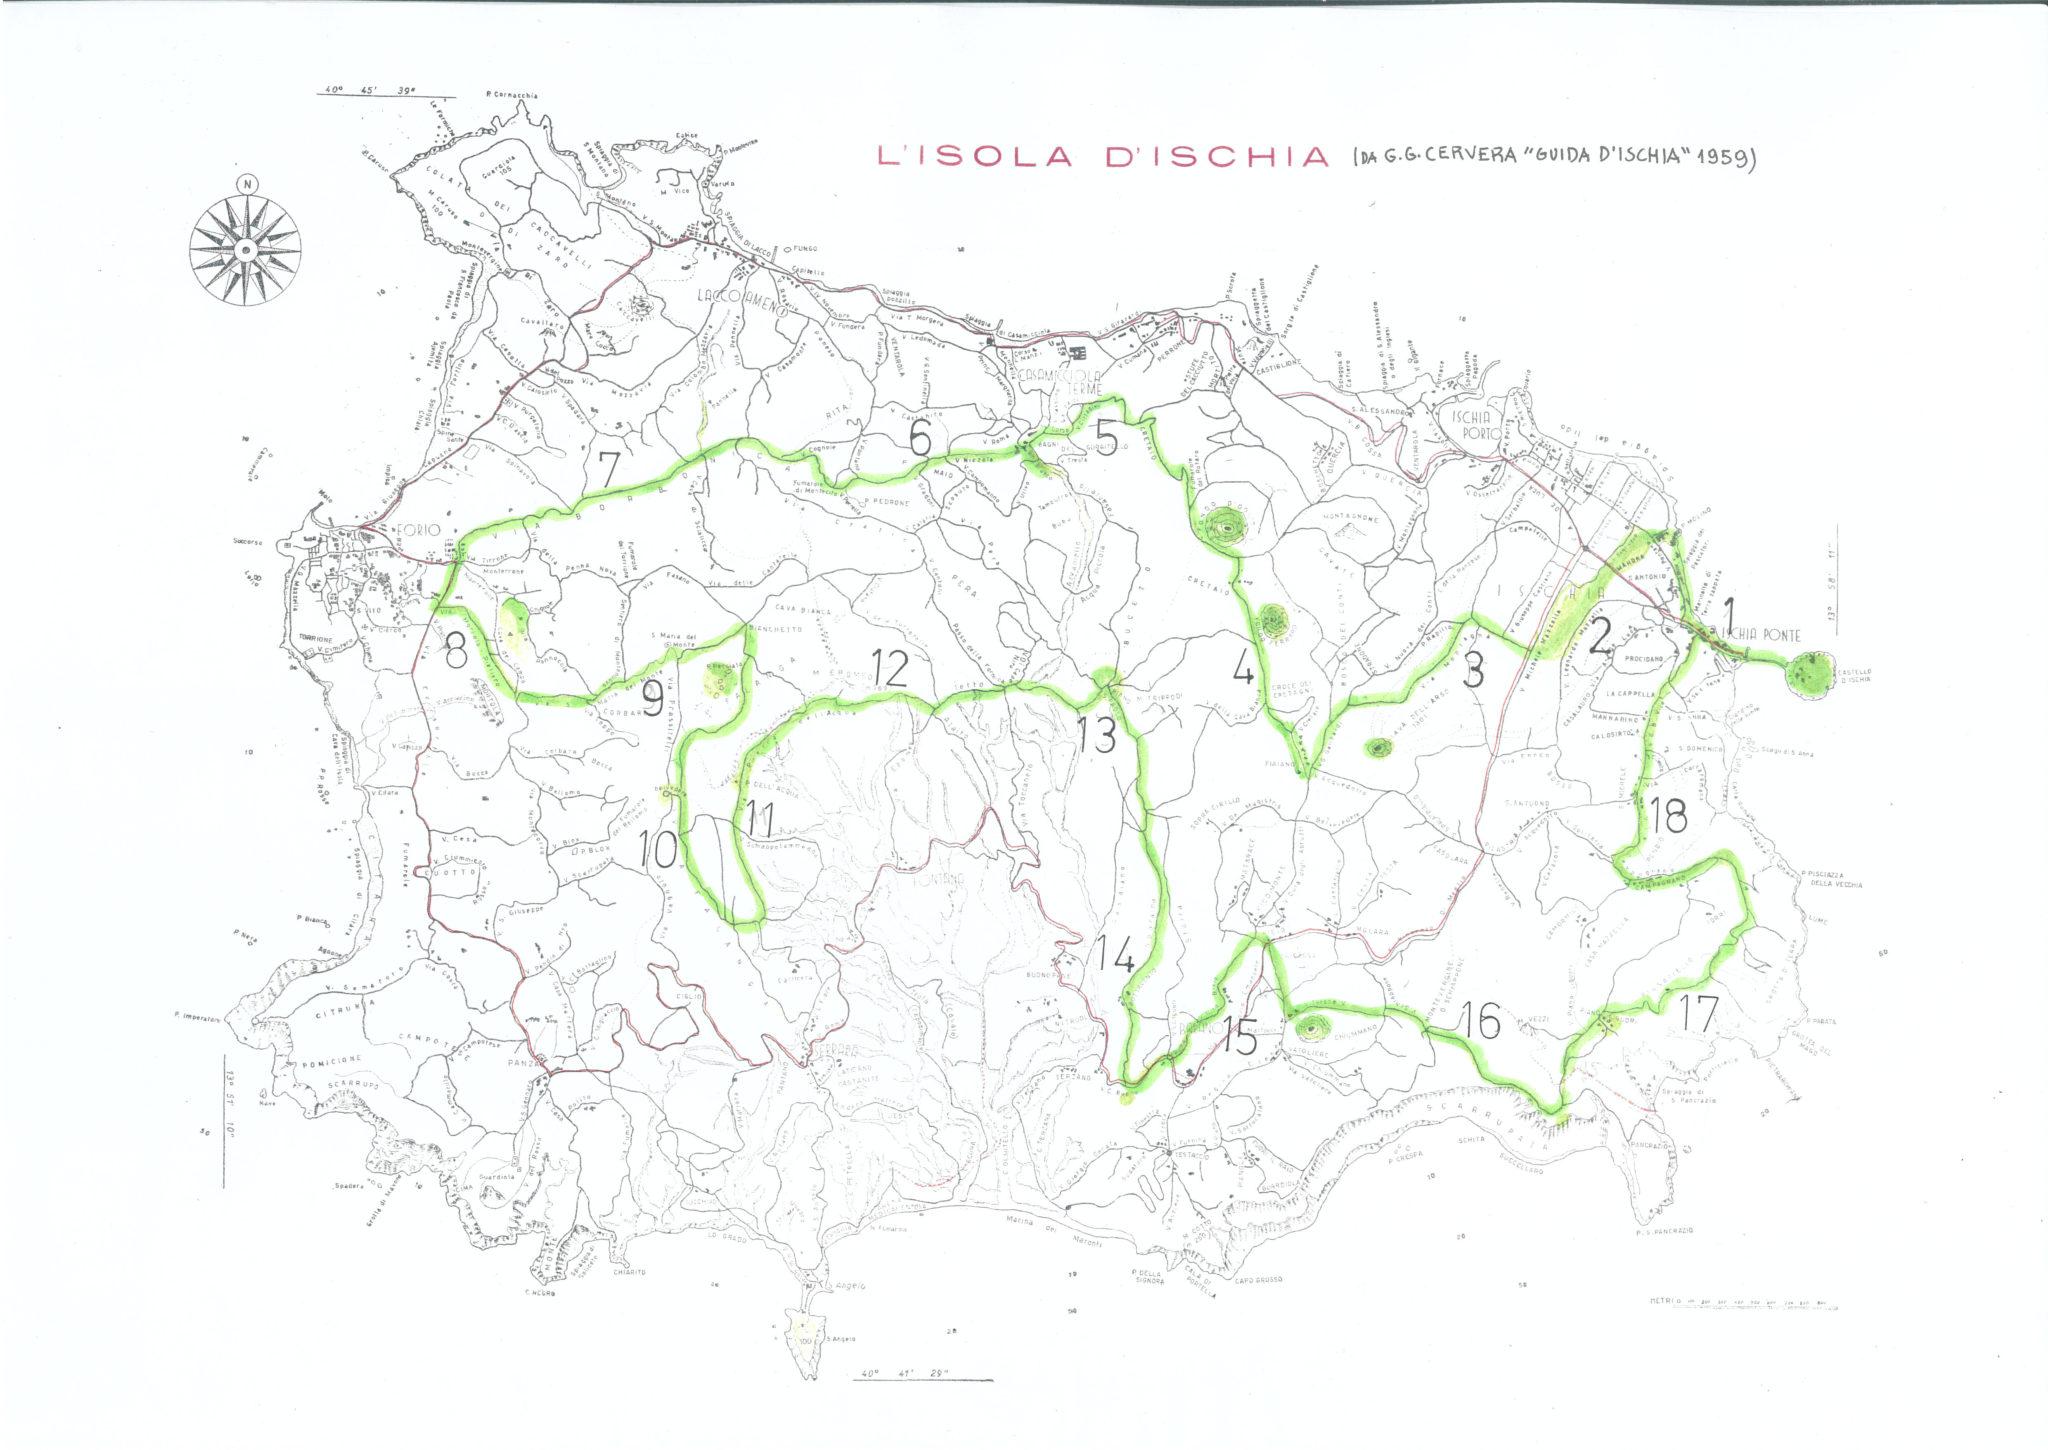 Mappa giro d'Ischia 1959